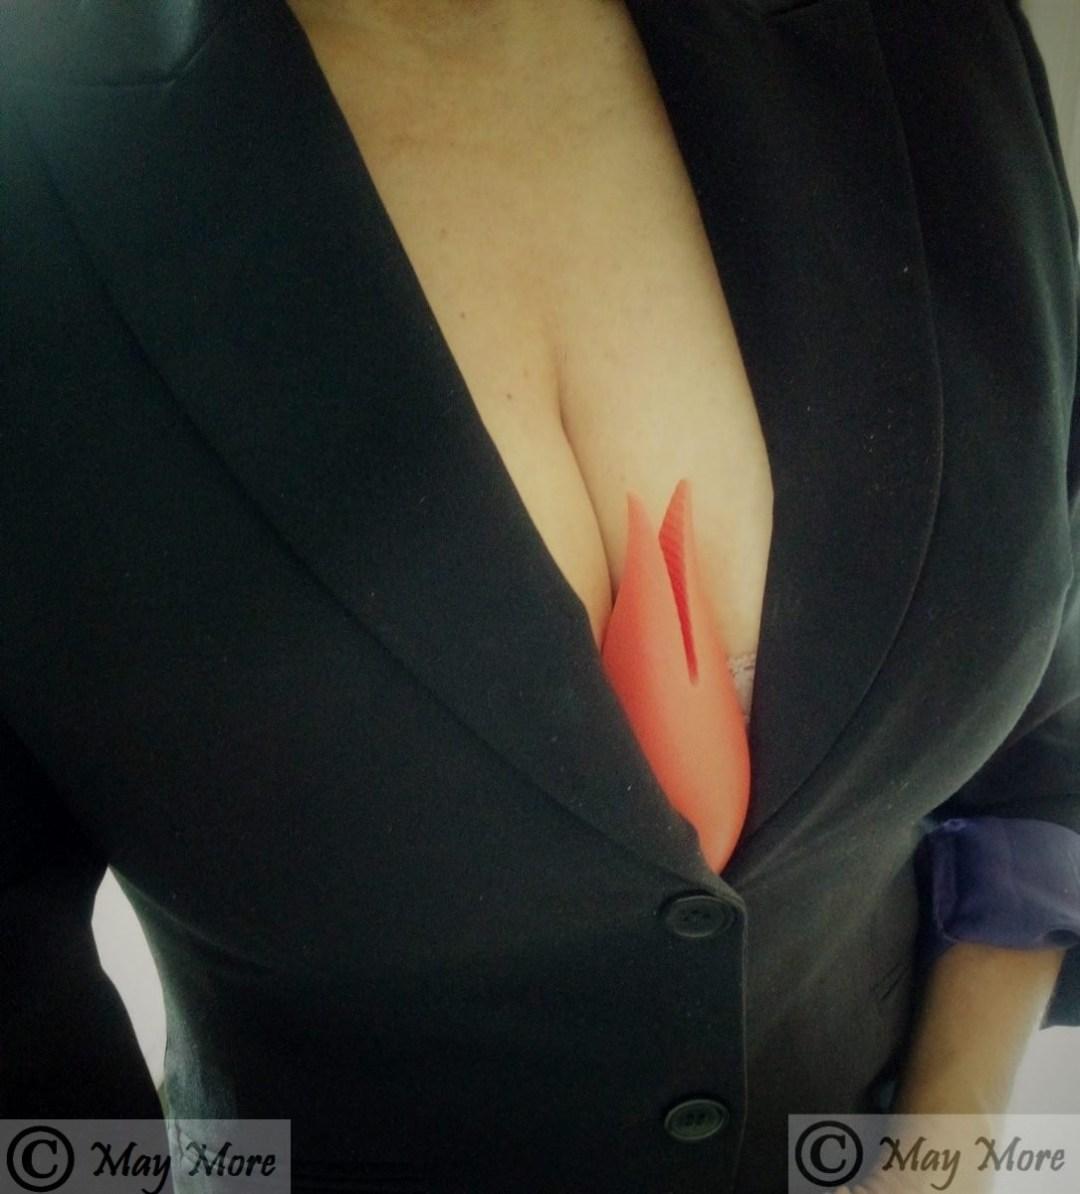 siren by skakom who make prostate massager